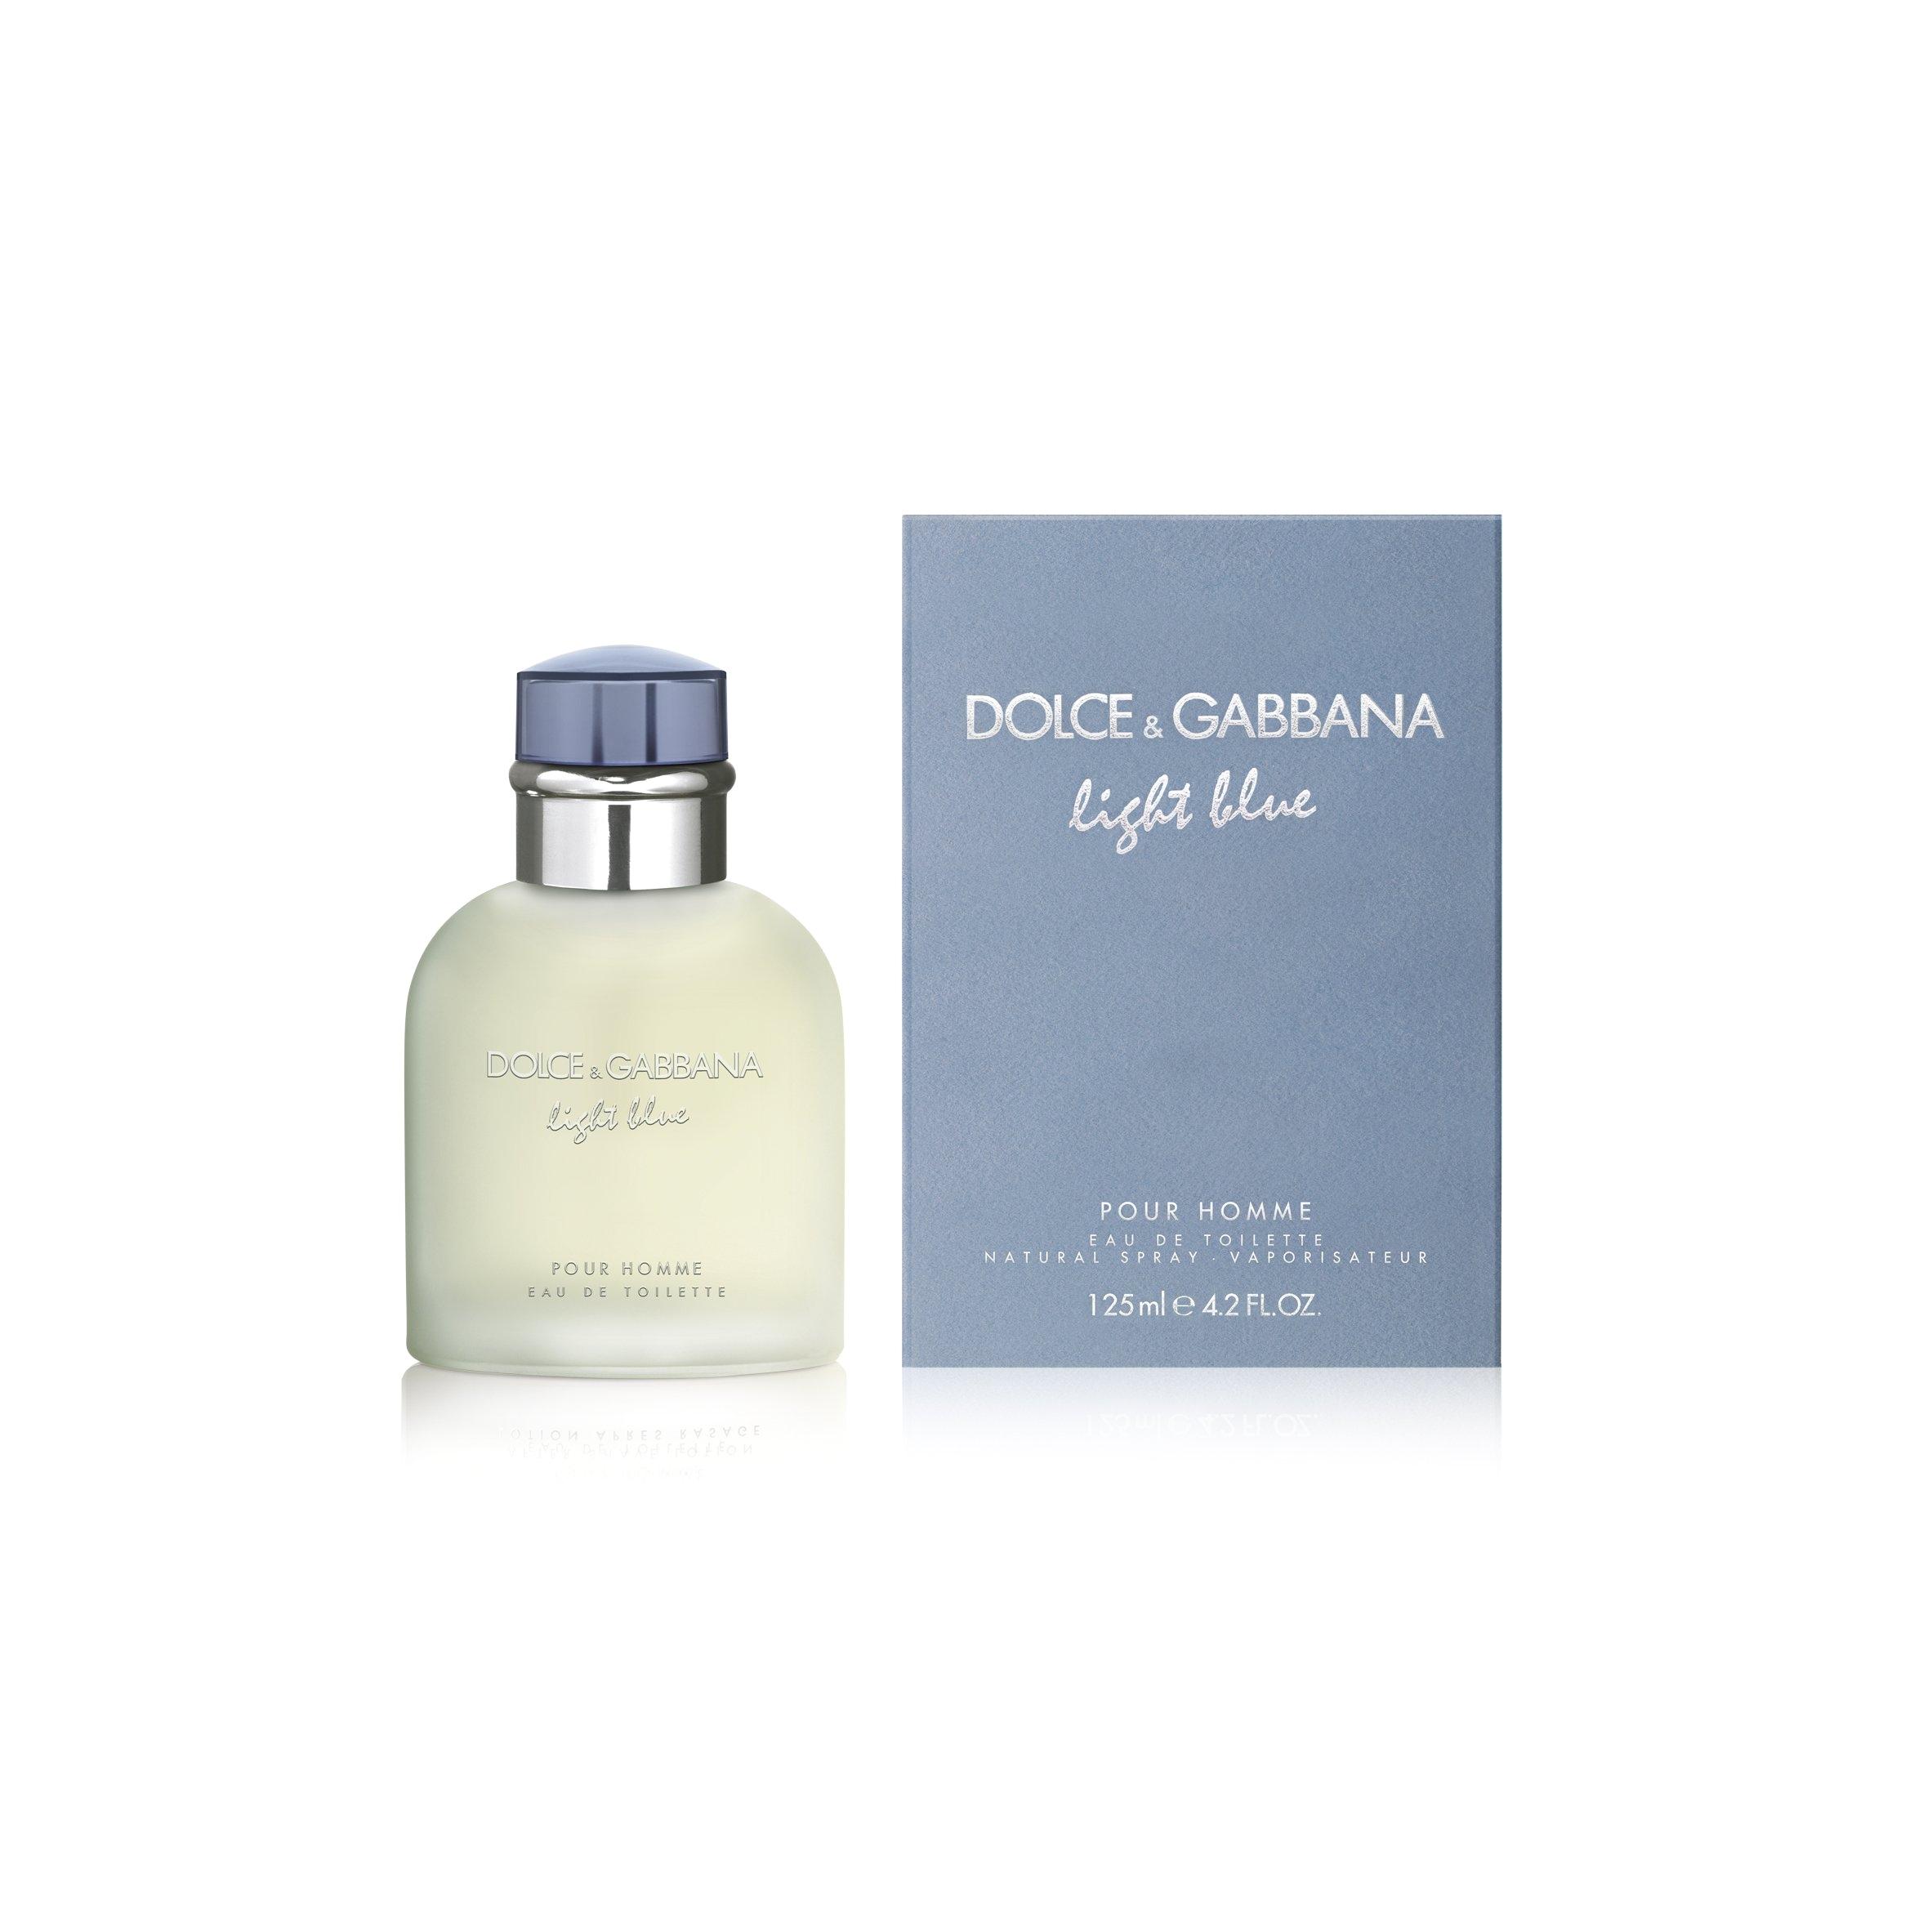 Dolce and Gabbana Light Blue Gift Set Amazon Com D G Light Blue by Dolce Gabbana for Men Deodorant